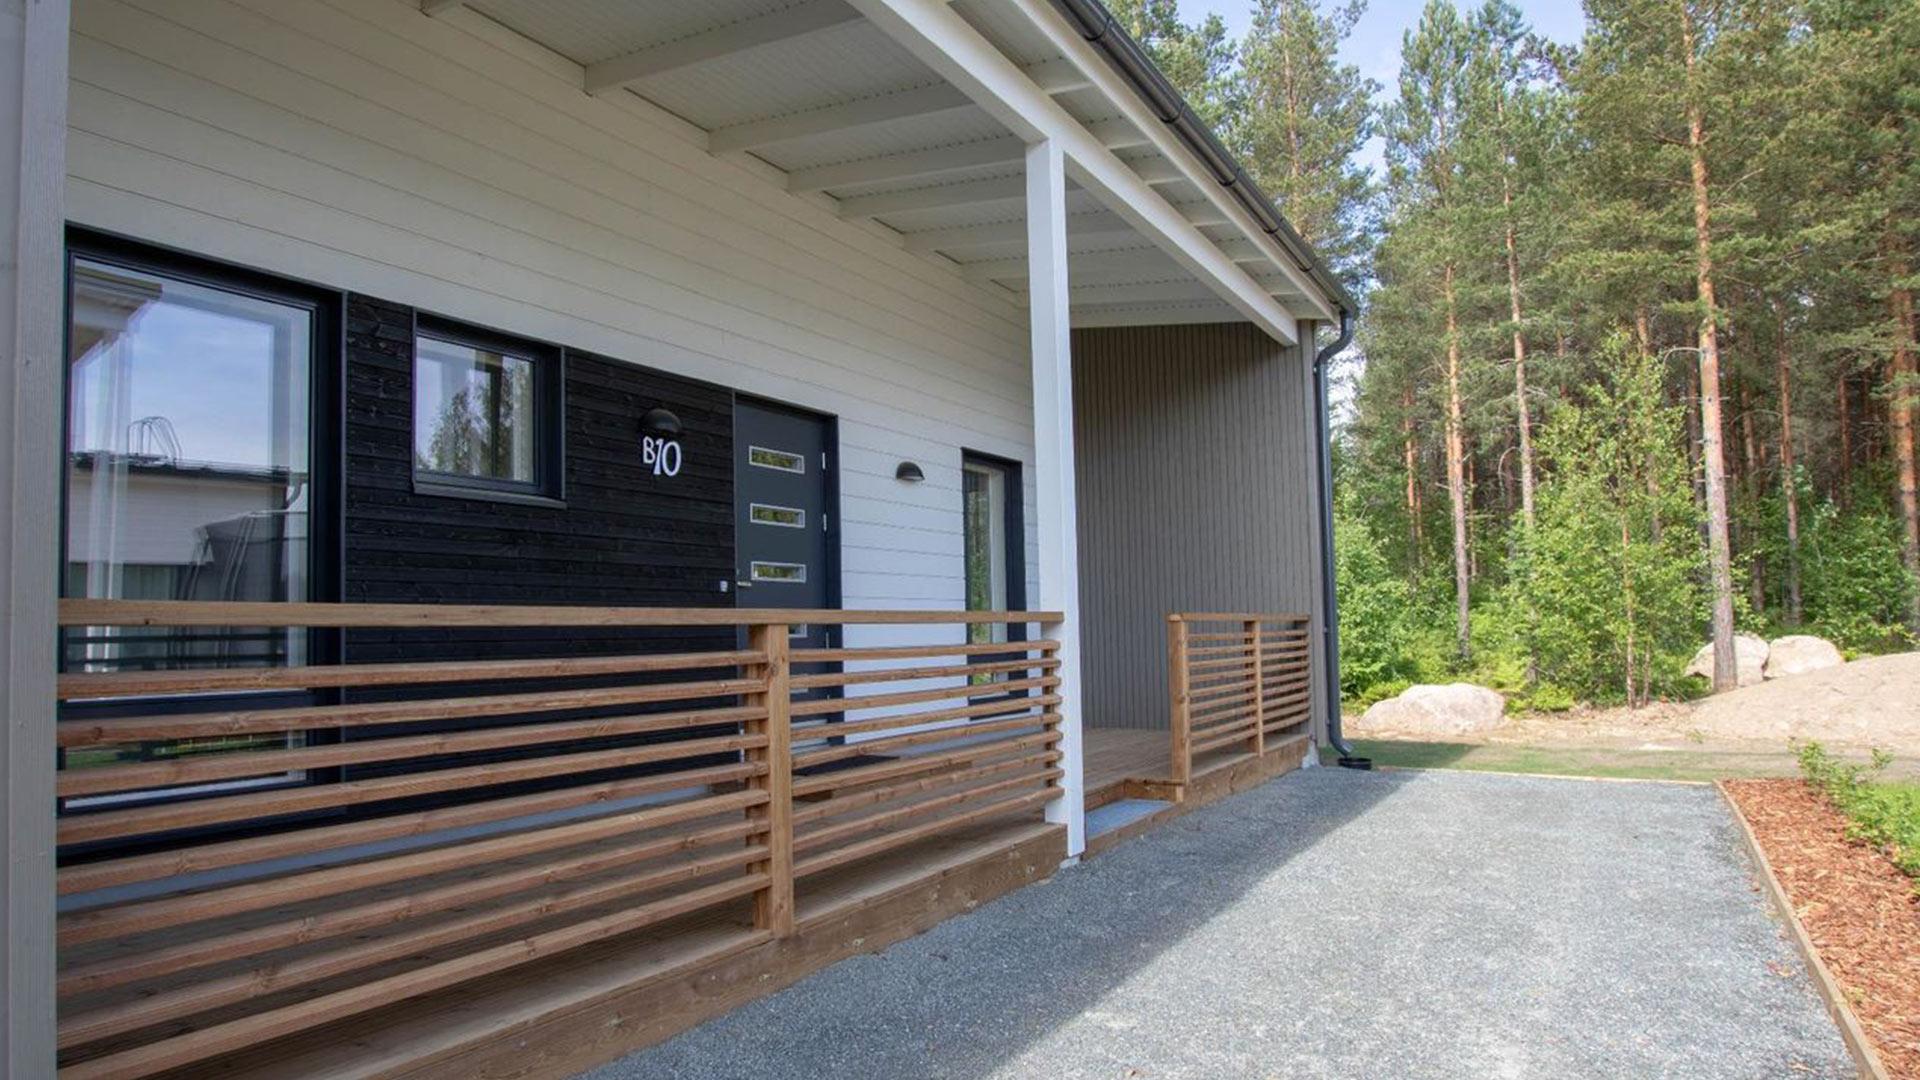 As Oy Jänönkallo, Rivitalo